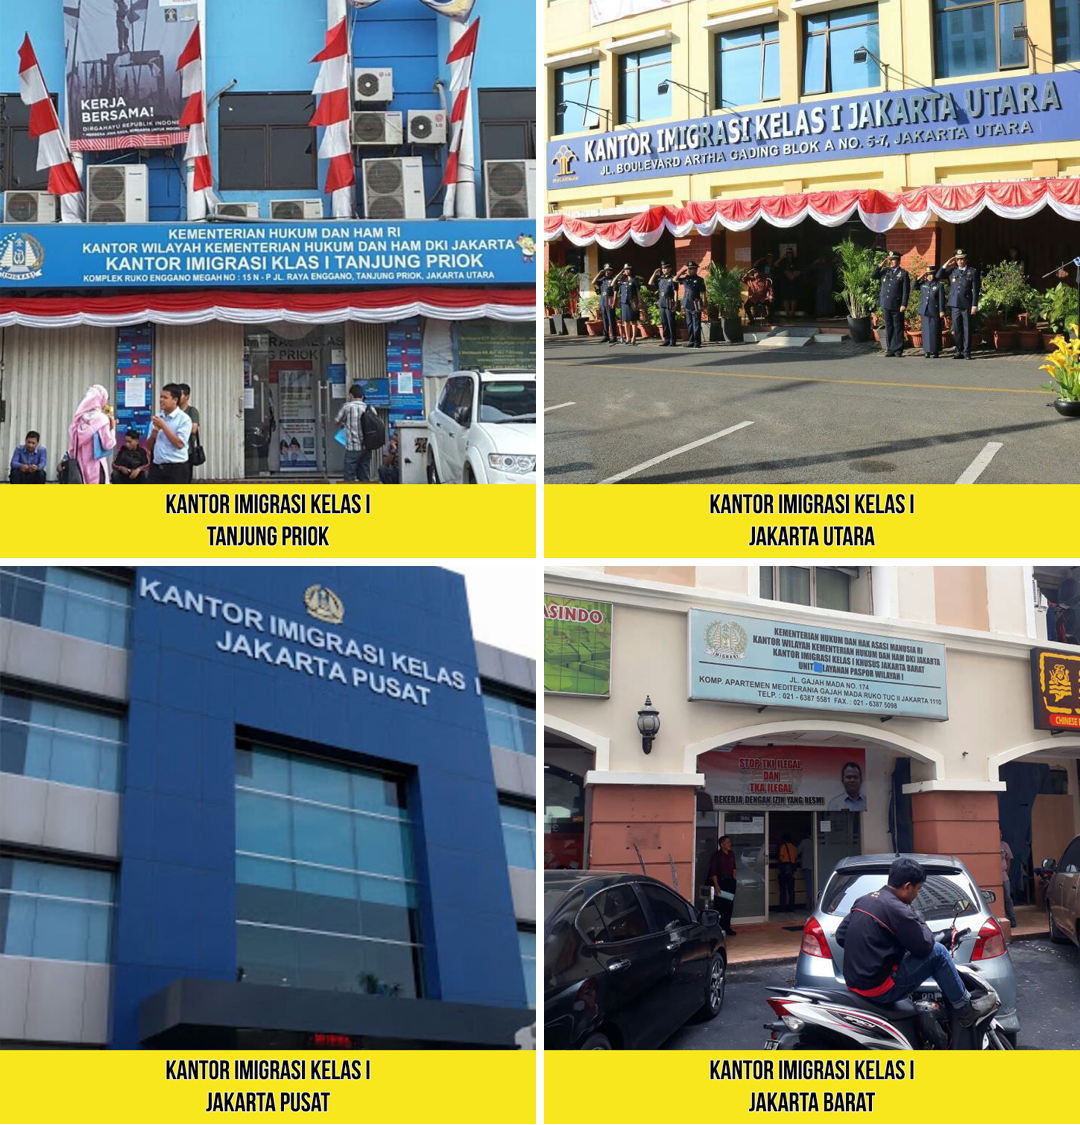 Kantor Imigrasi Jakarta